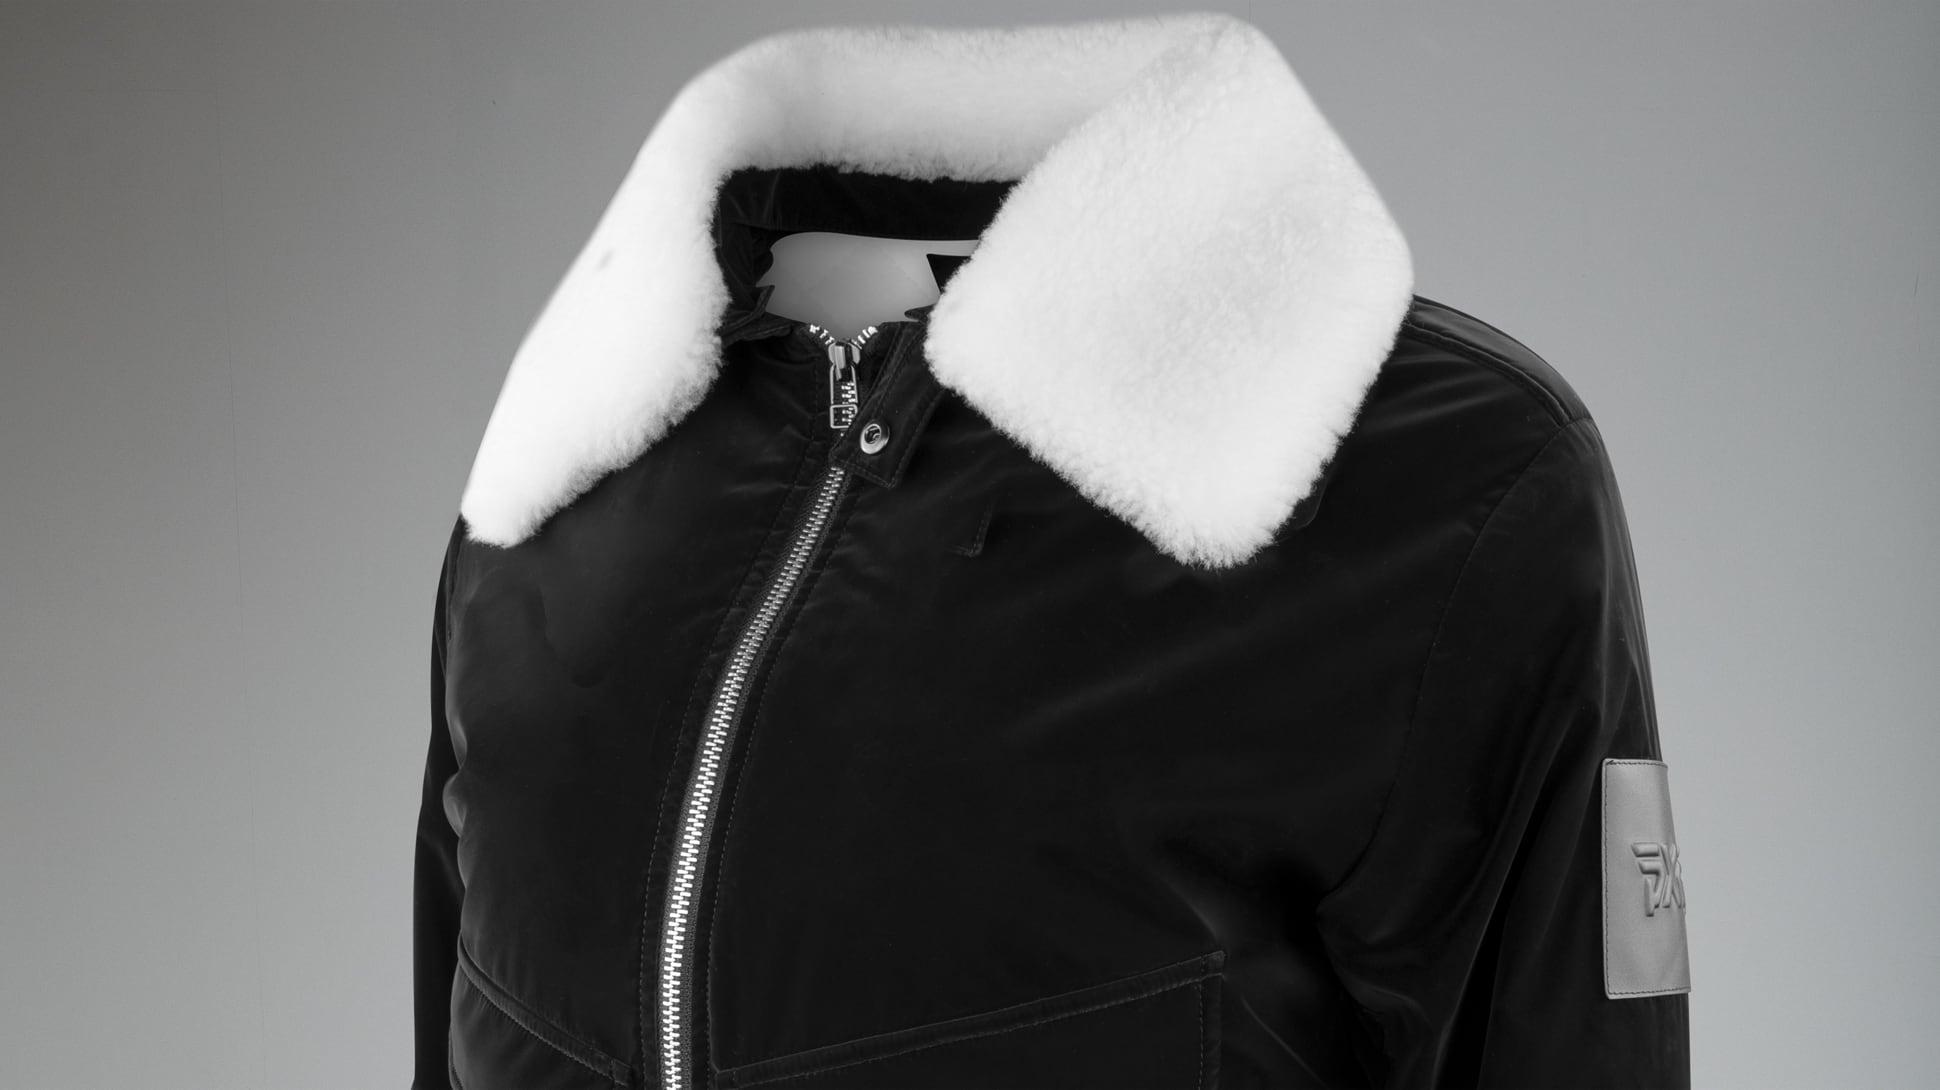 Winter-Ready Wool Bomber Jacket Image 2